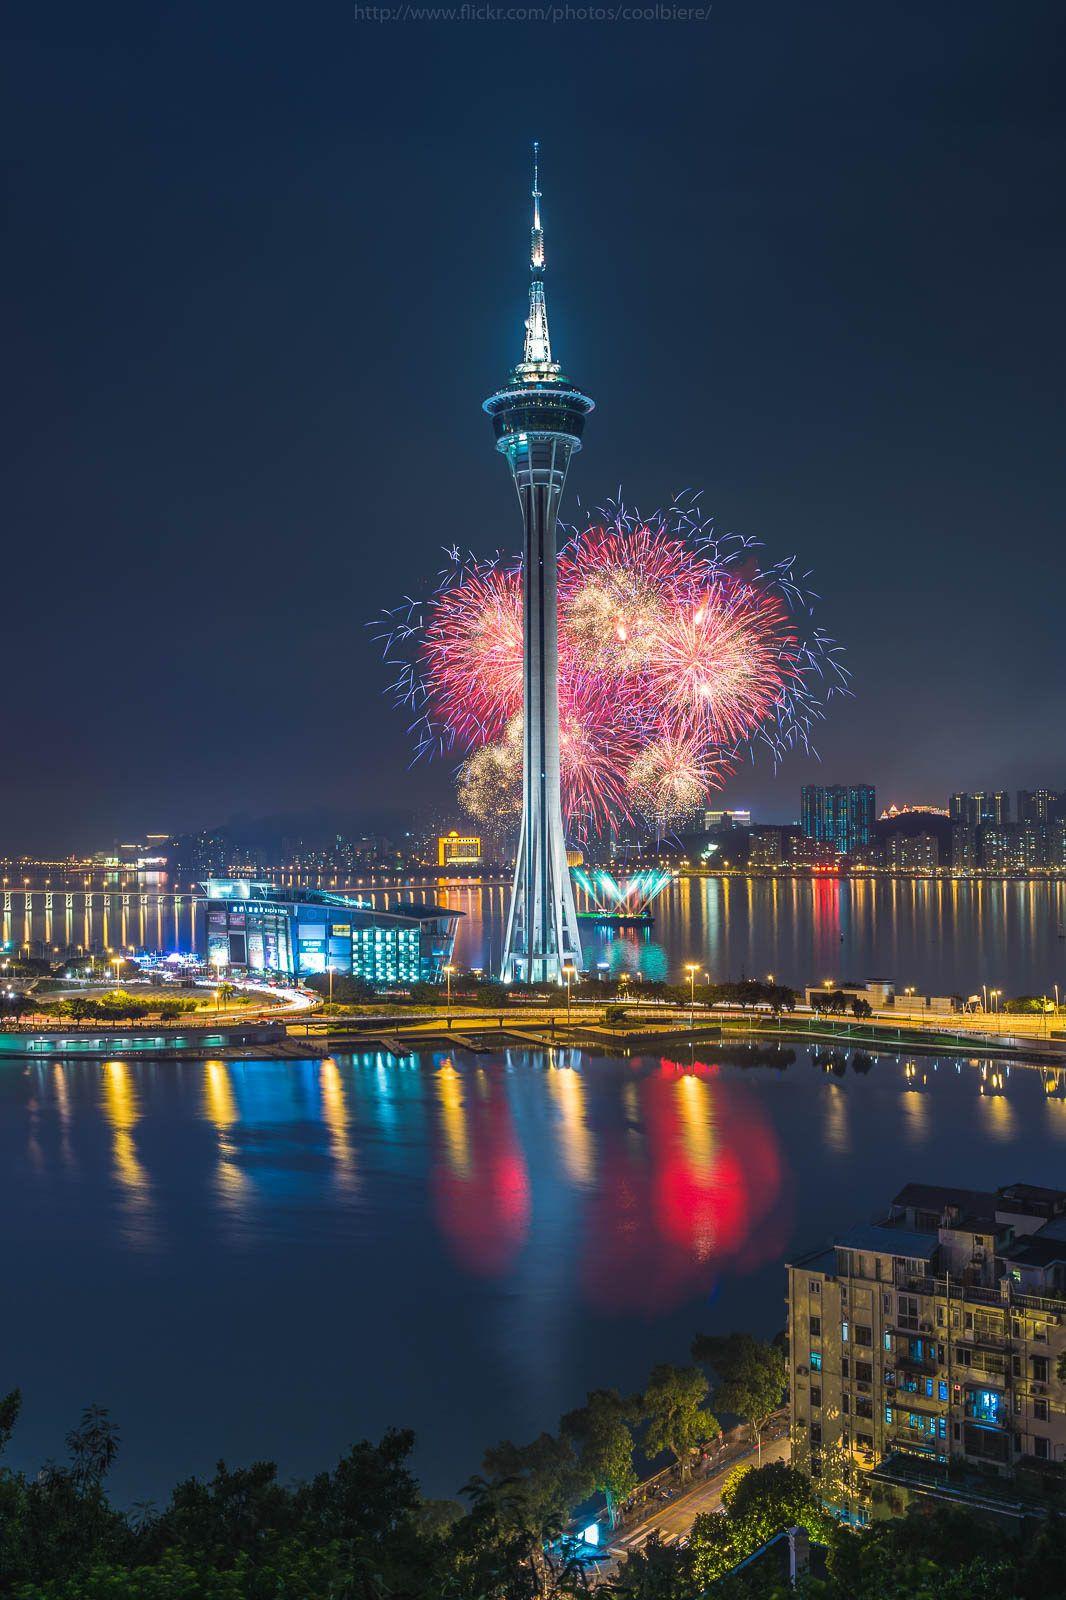 Macau fireworks 2015